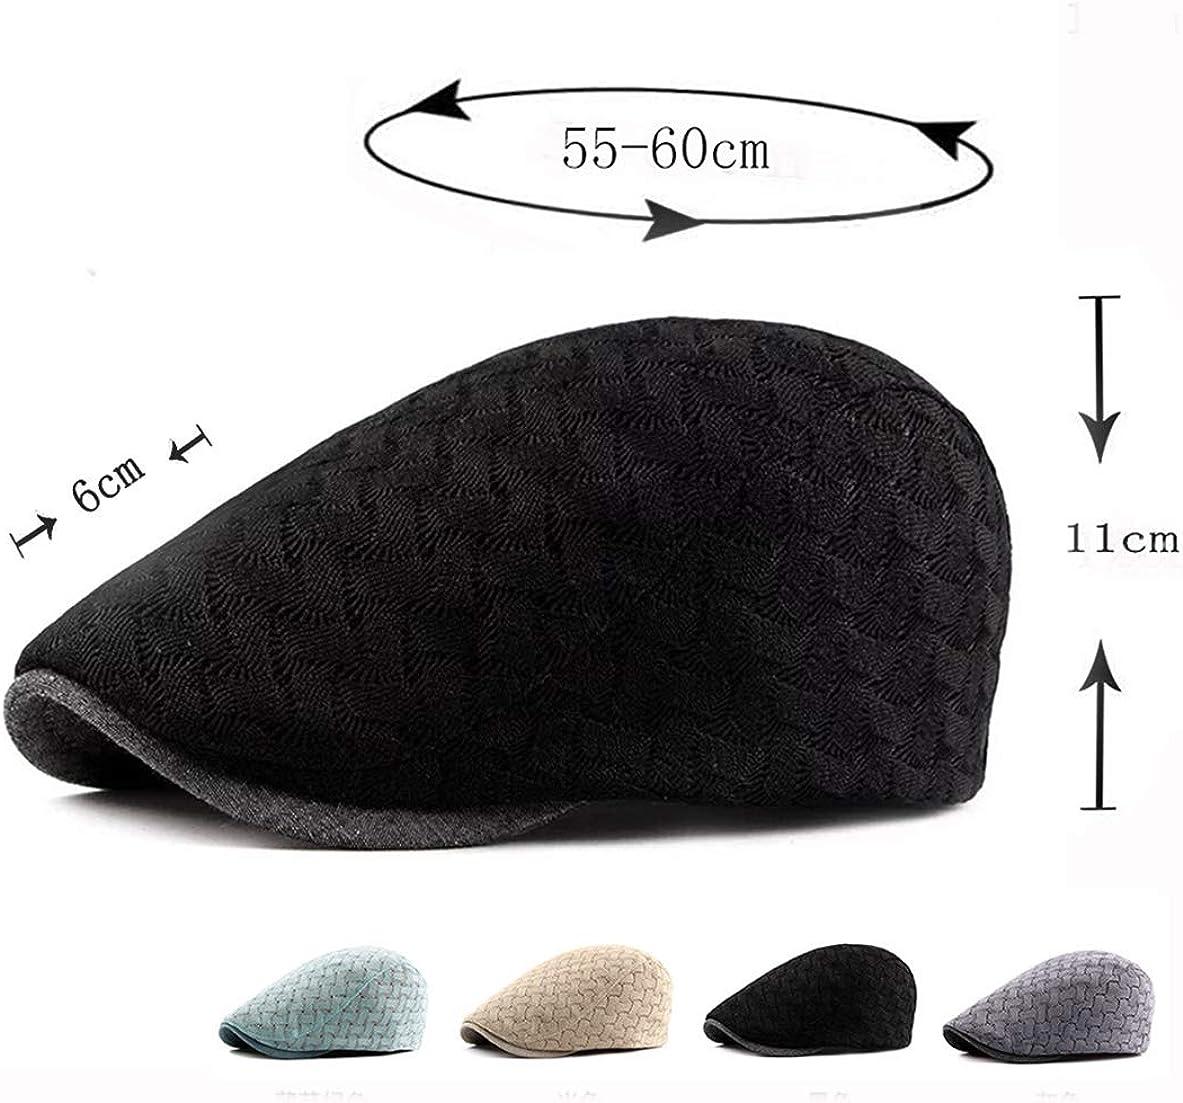 Schieberm/ütze Flatcap Herren Sommer Schirmm/ützen Atmungsaktive irisch Baskenm/ütze Kappe Cabbie Hut